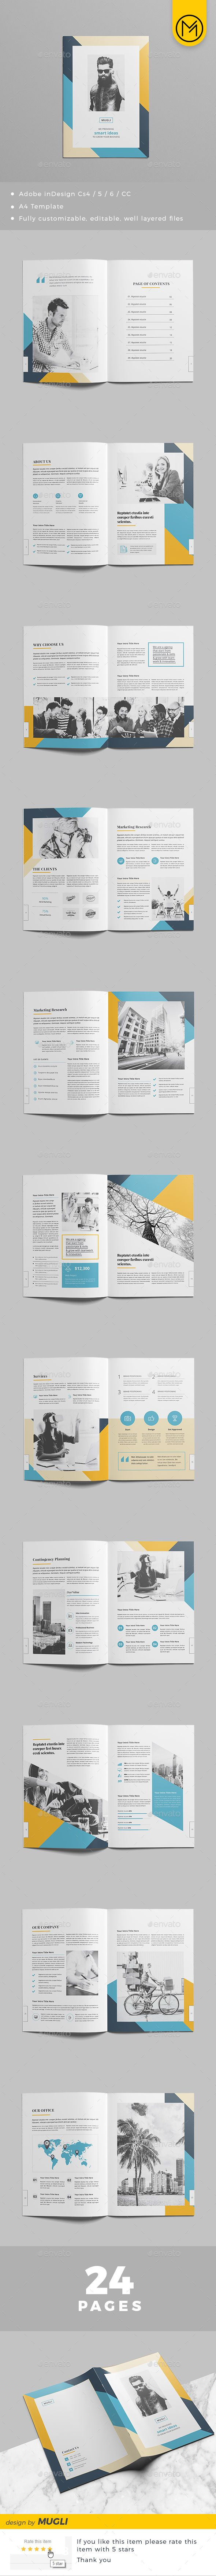 Brochure #professional #report • Download ➝ https://graphicriver.net/item/brochure/21313443?ref=pxcr